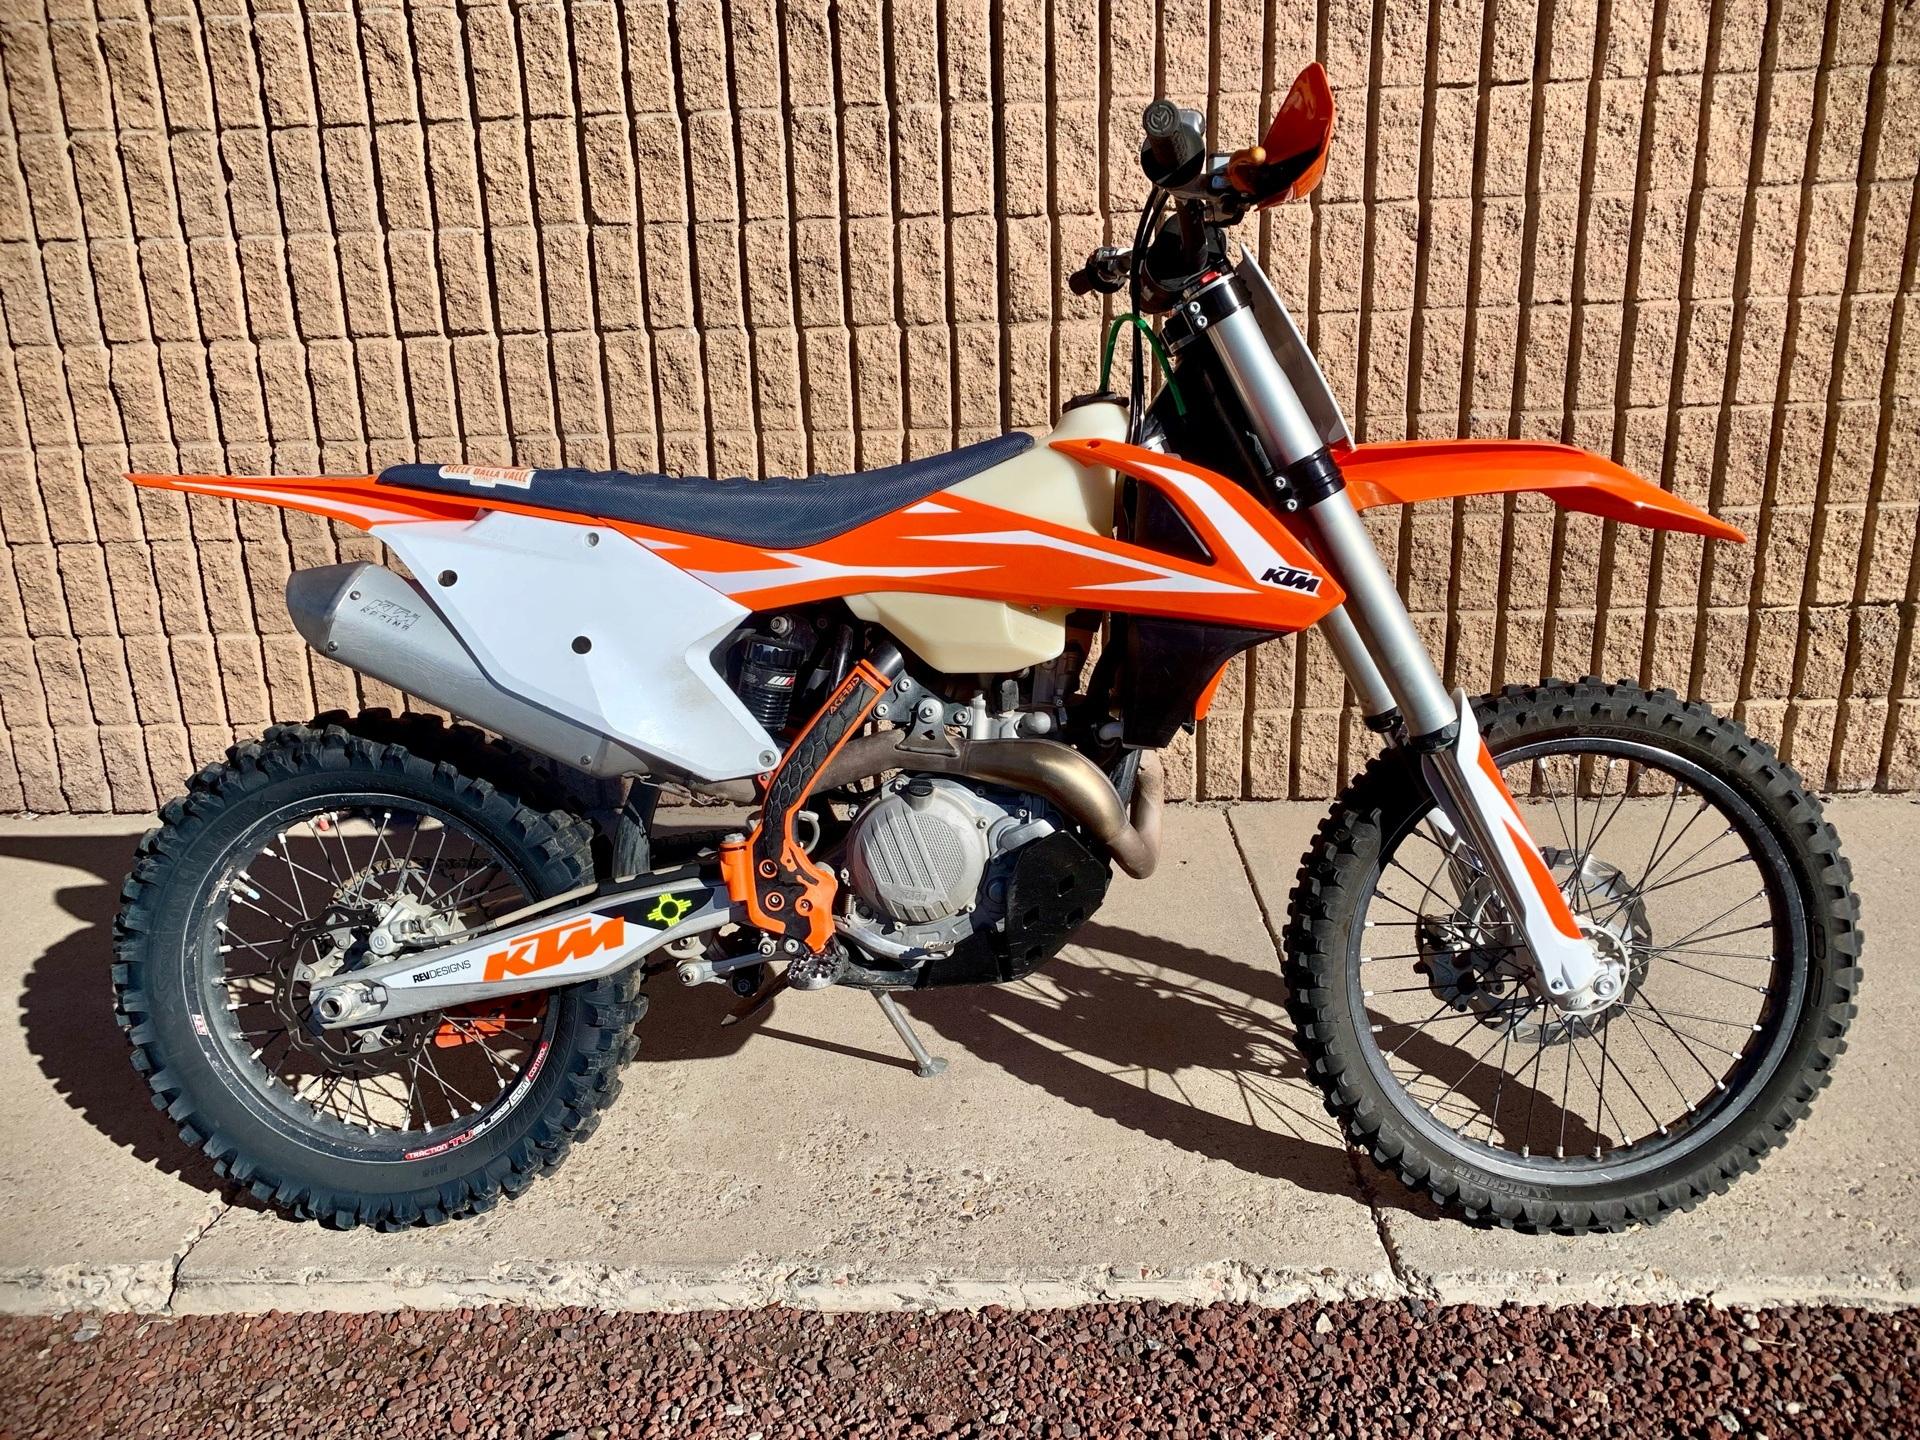 2016 Ktm 450 Xc F In Albuquerque New Mexico